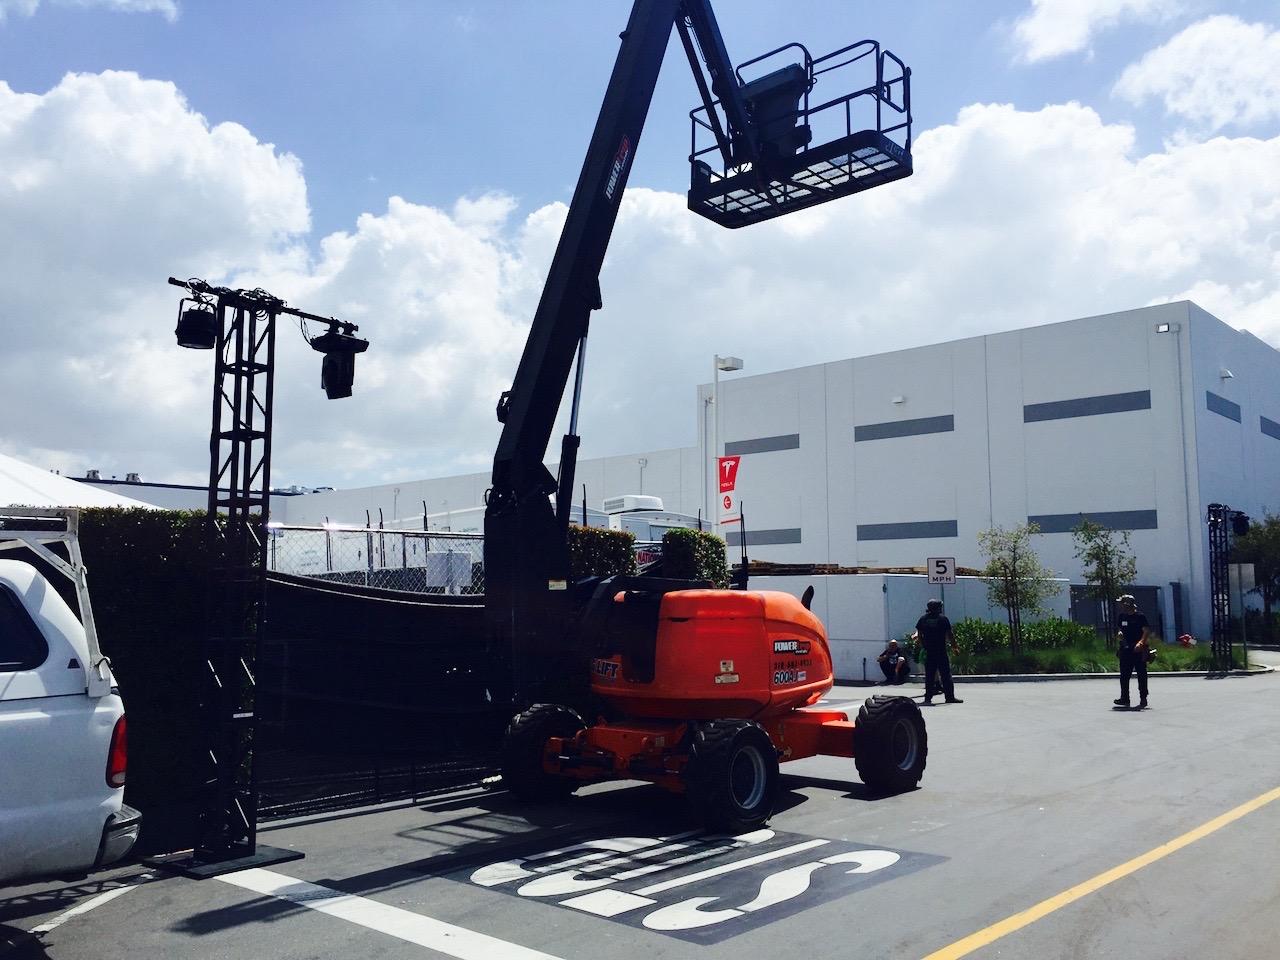 Tesla Model 3 Event Preparations